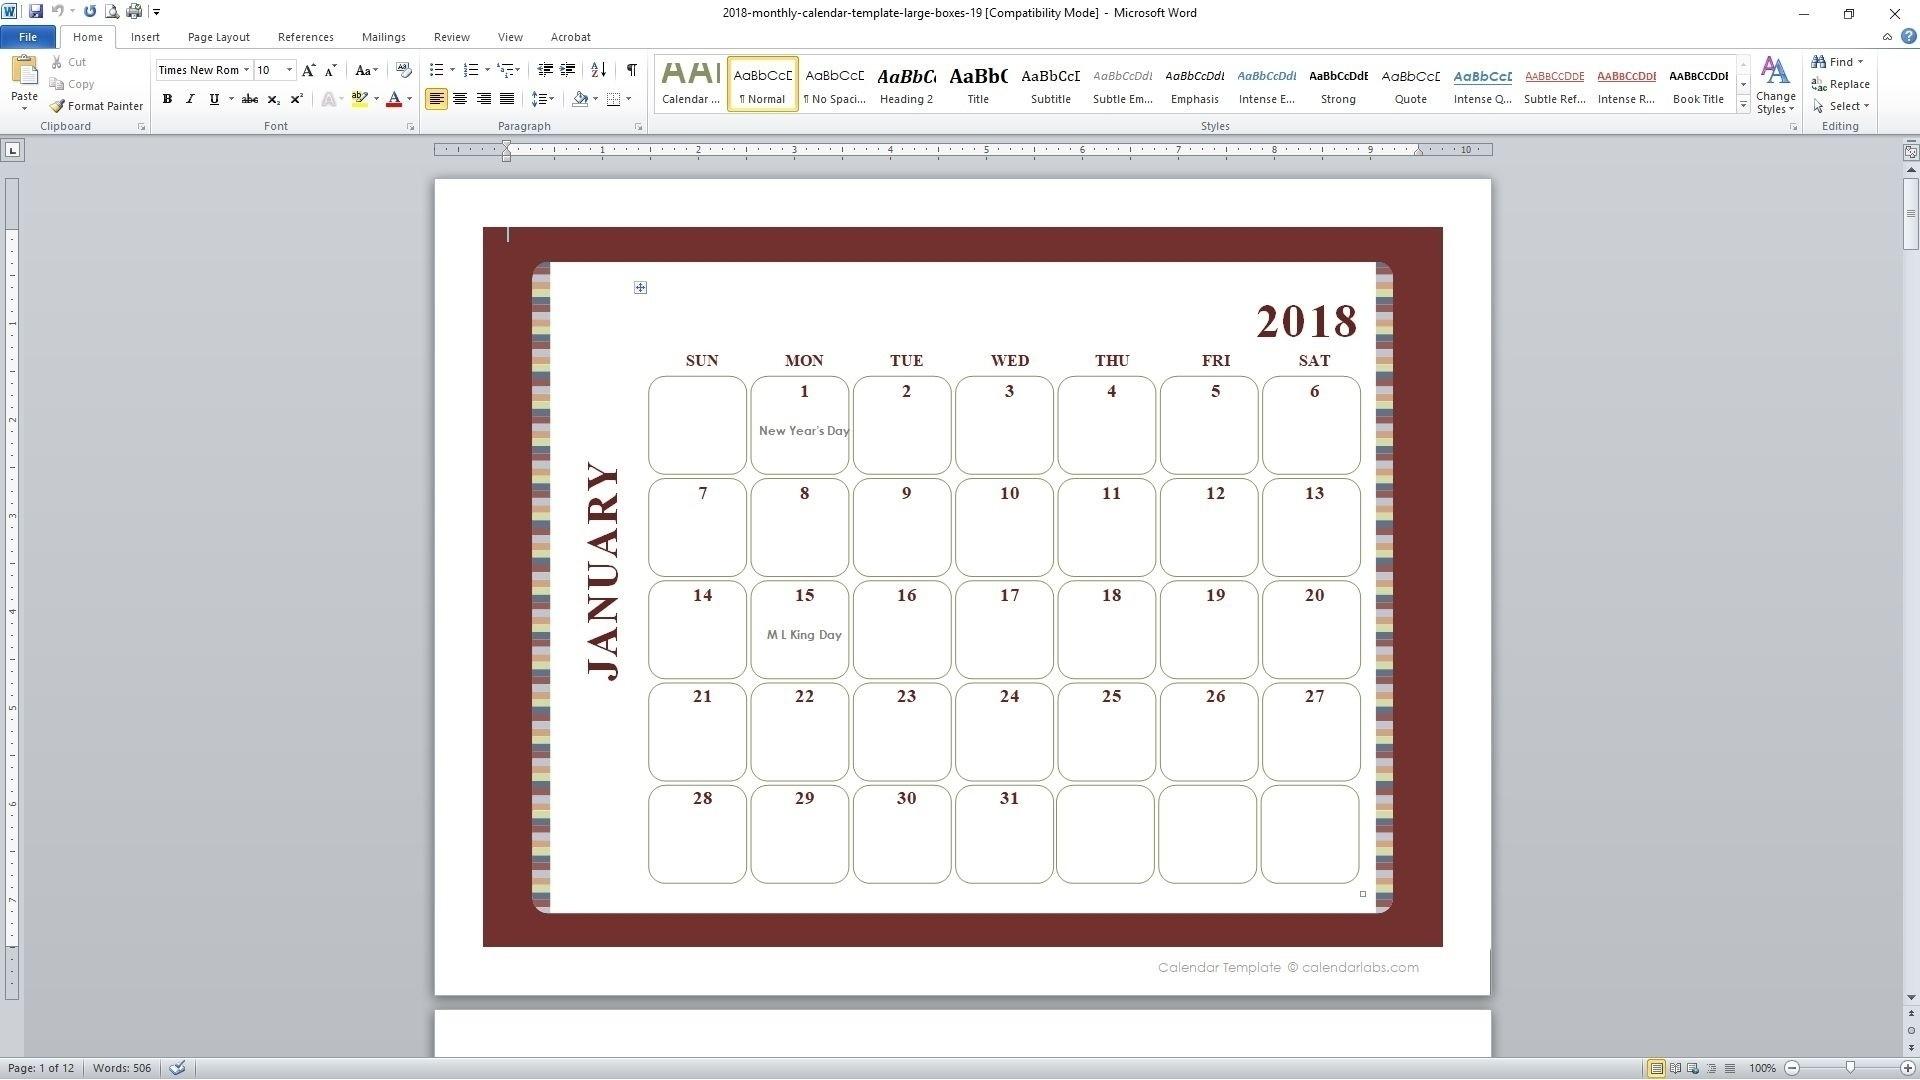 5 Day Monthly Calendar Free • Printable Blank Calendar Template  Printable 5 Day Monthly Calendar